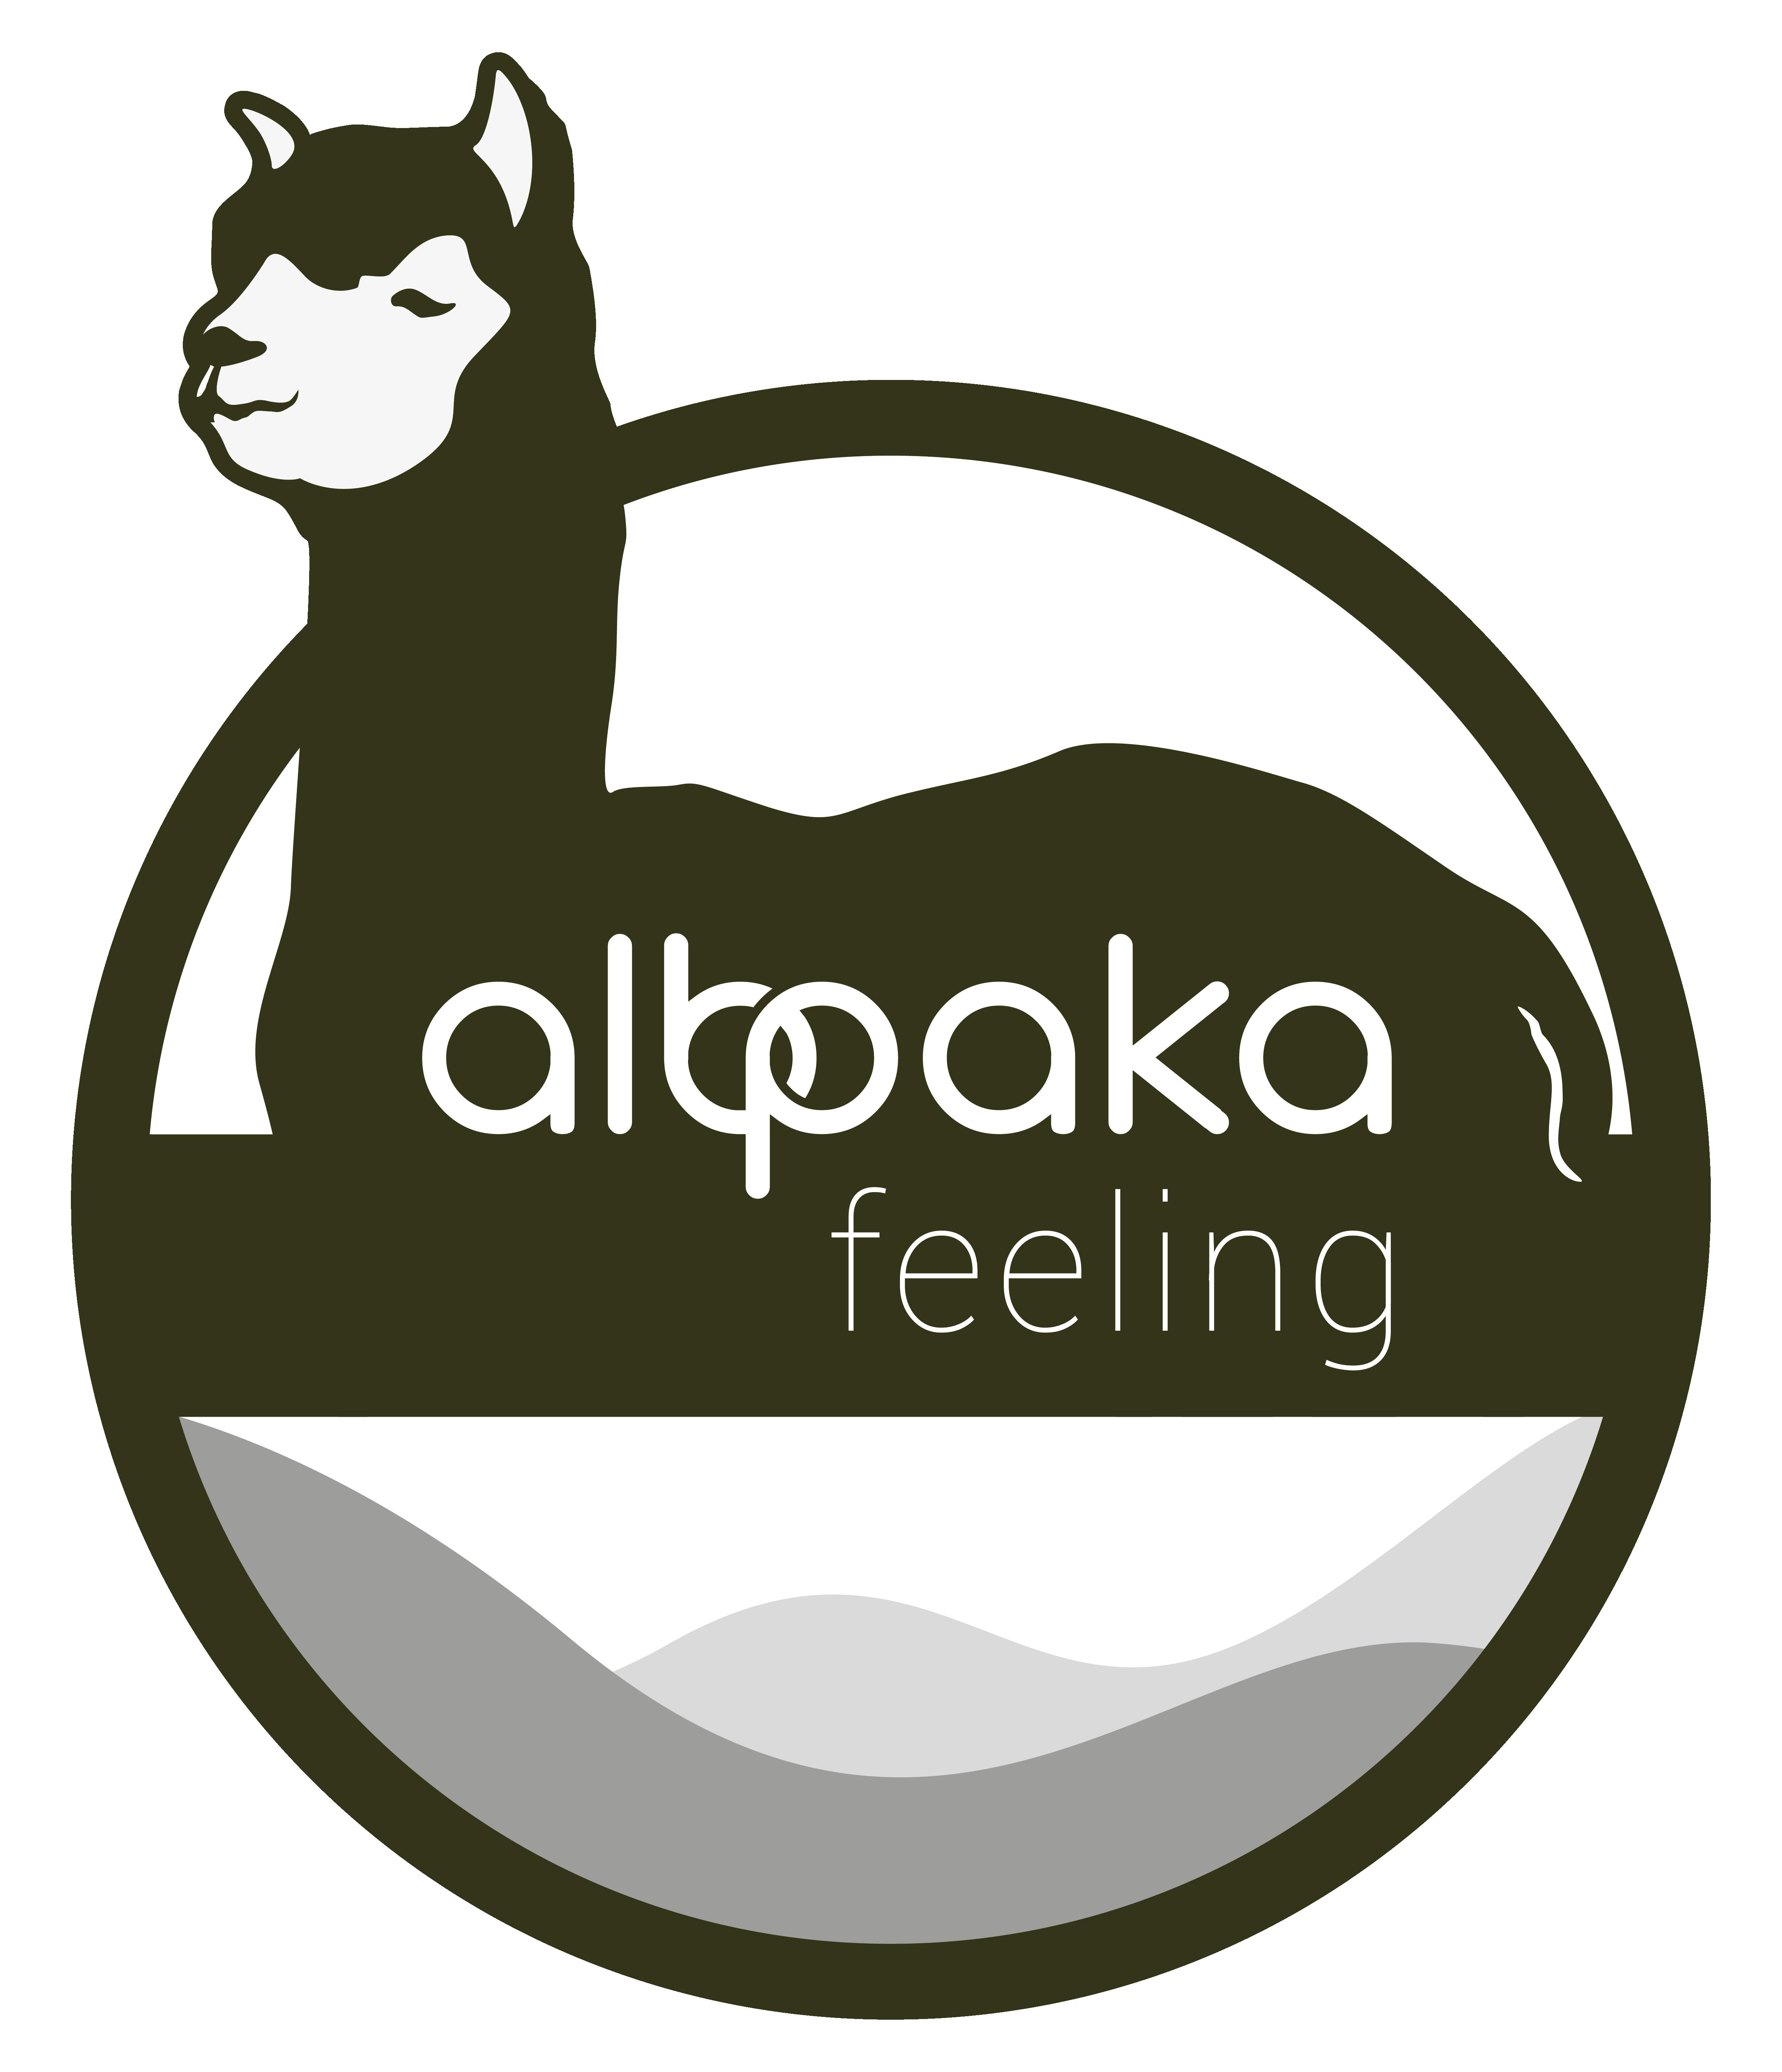 Alb-paka feeling